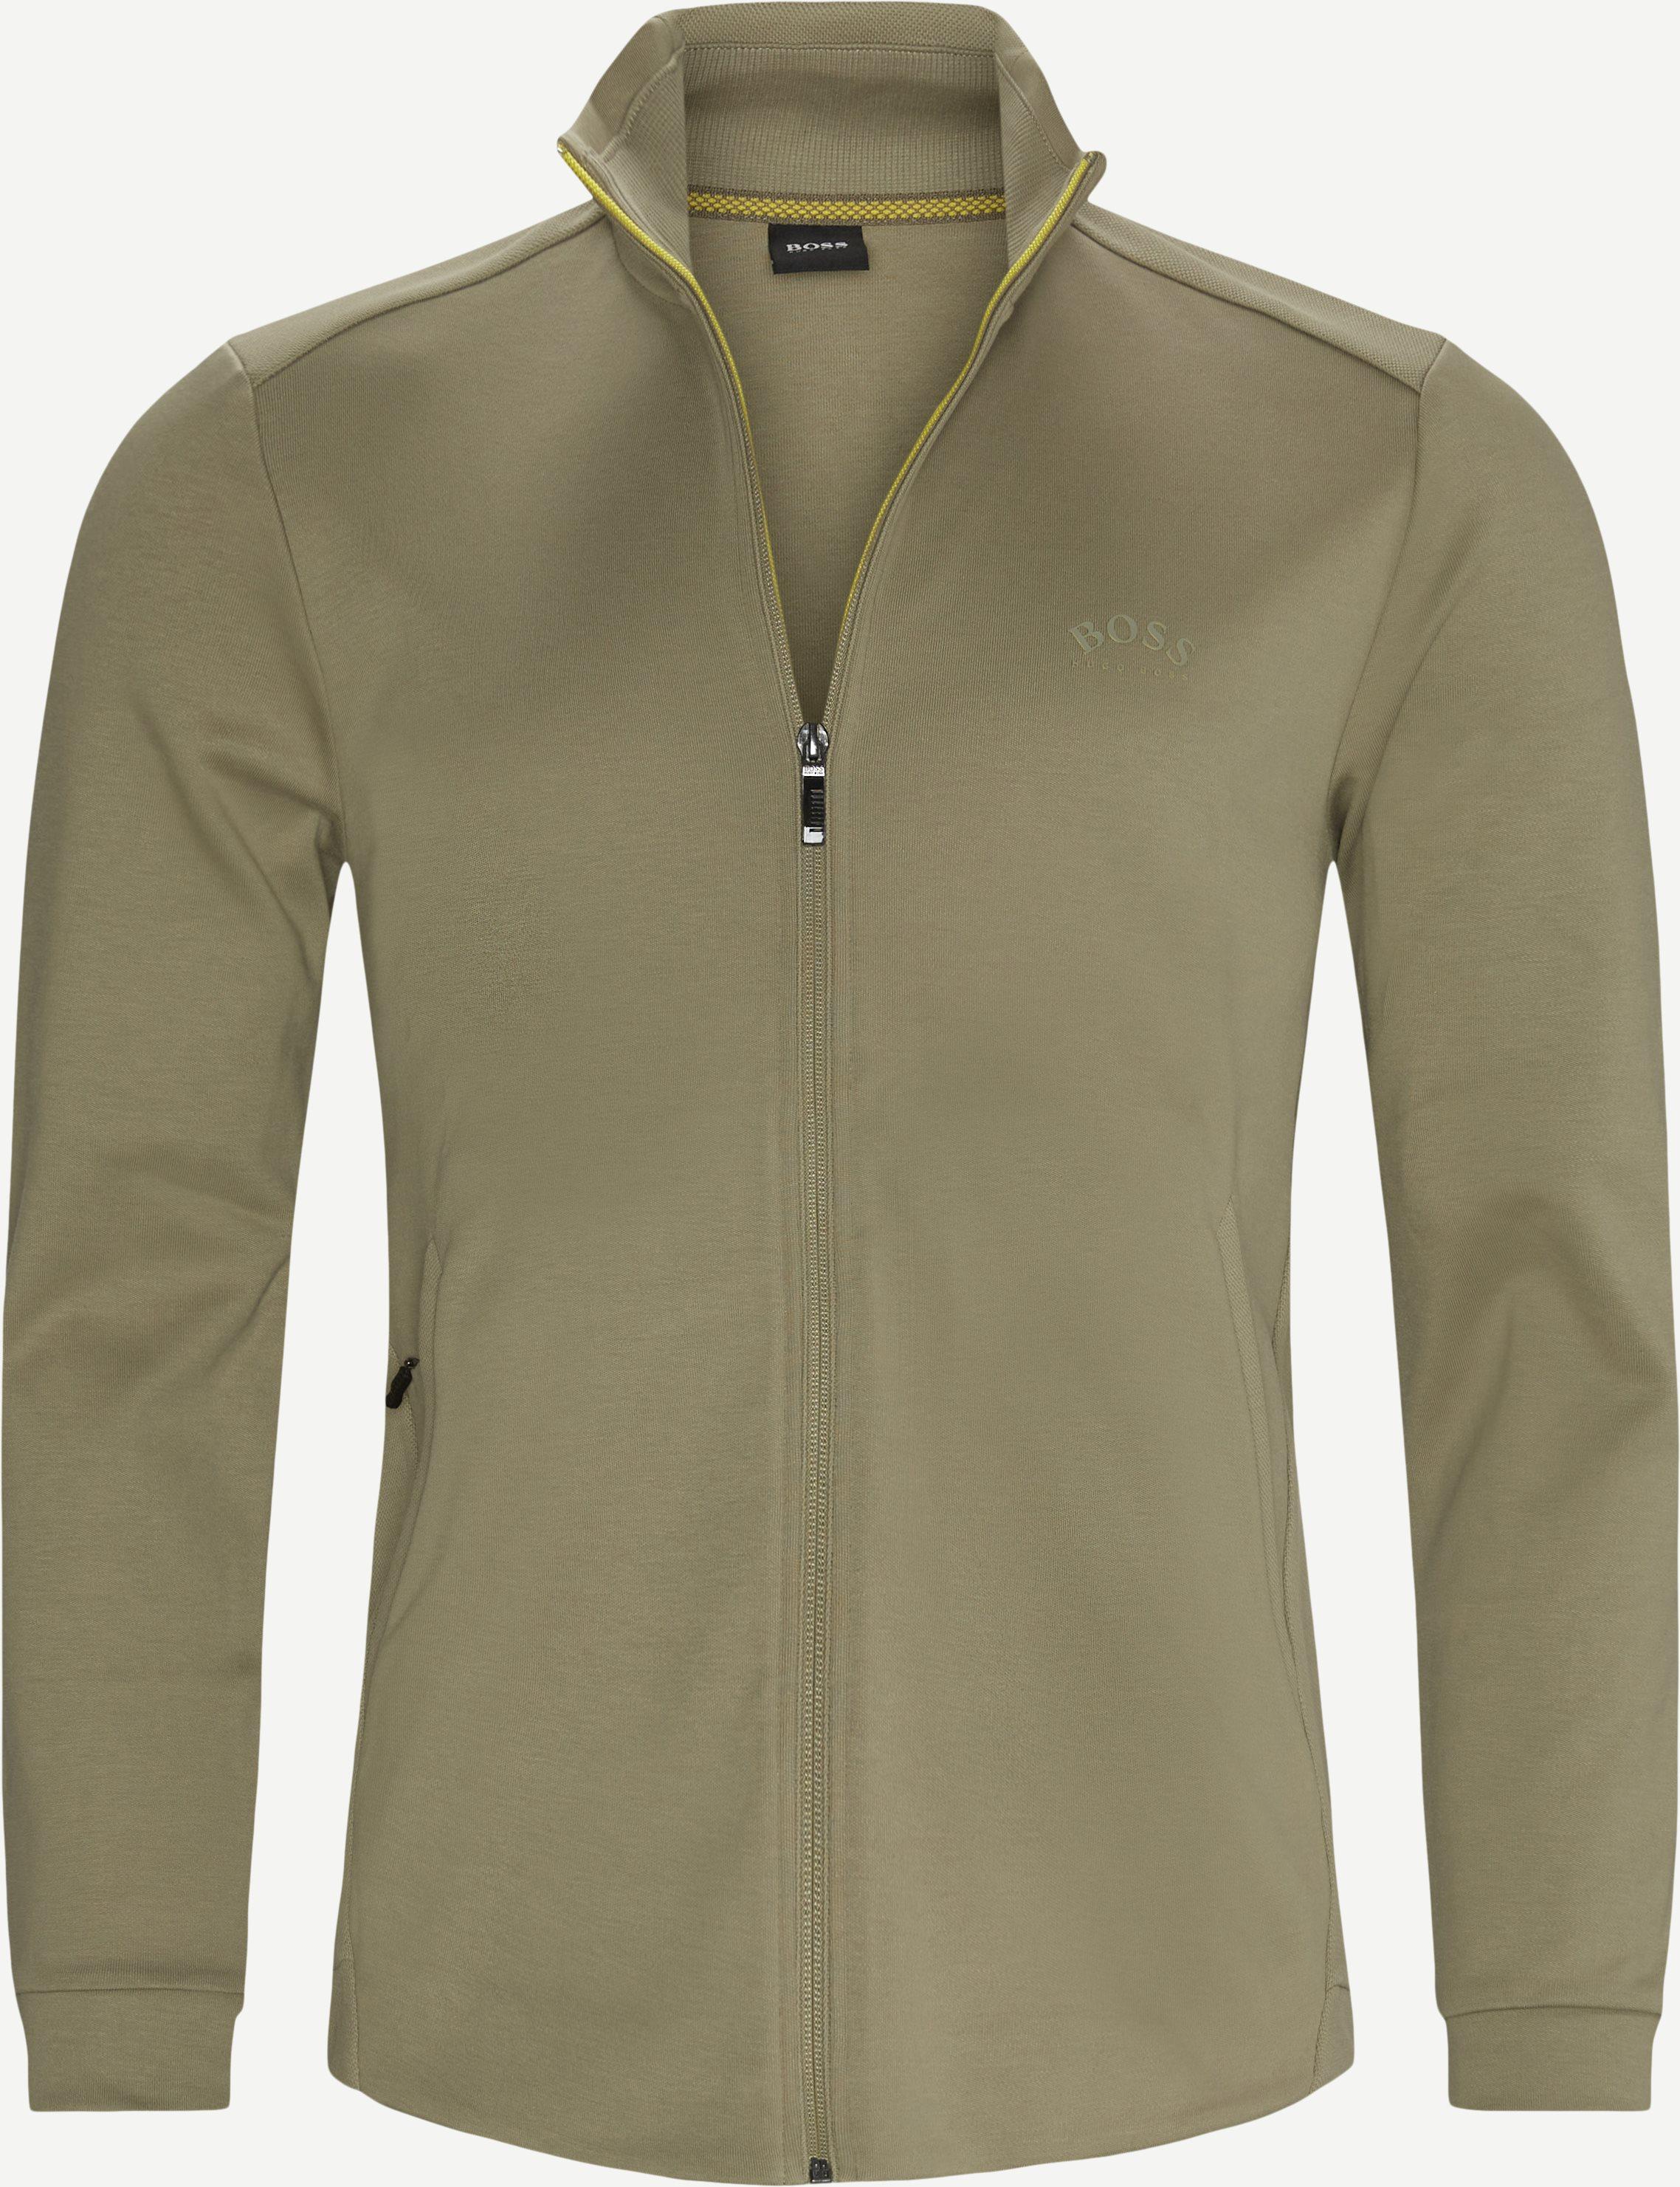 Skaz Zip Sweatshirt - Sweatshirts - Regular fit - Army